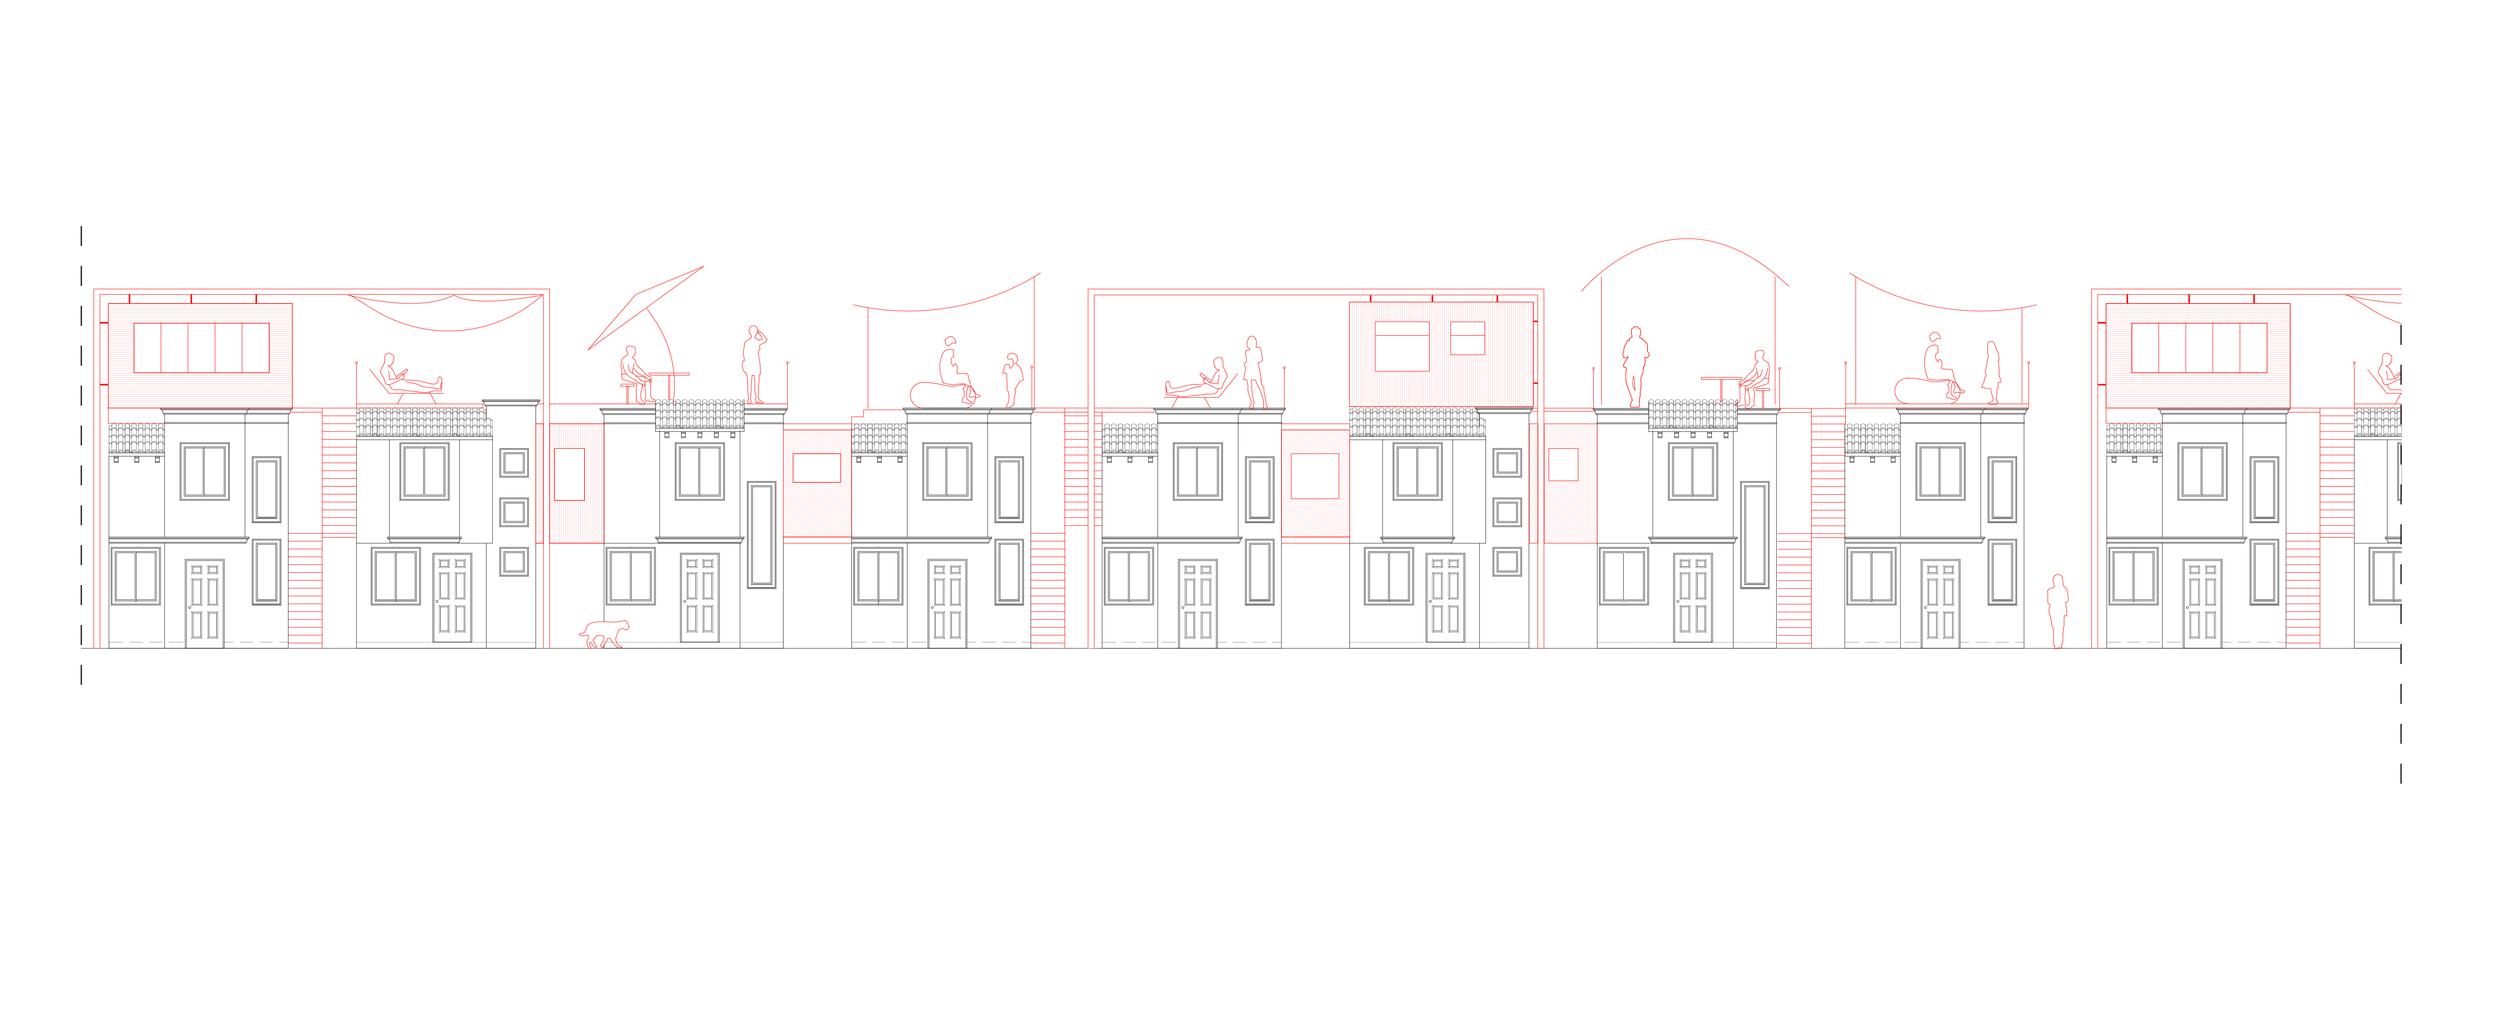 Rooftop extensions an horizontal infills